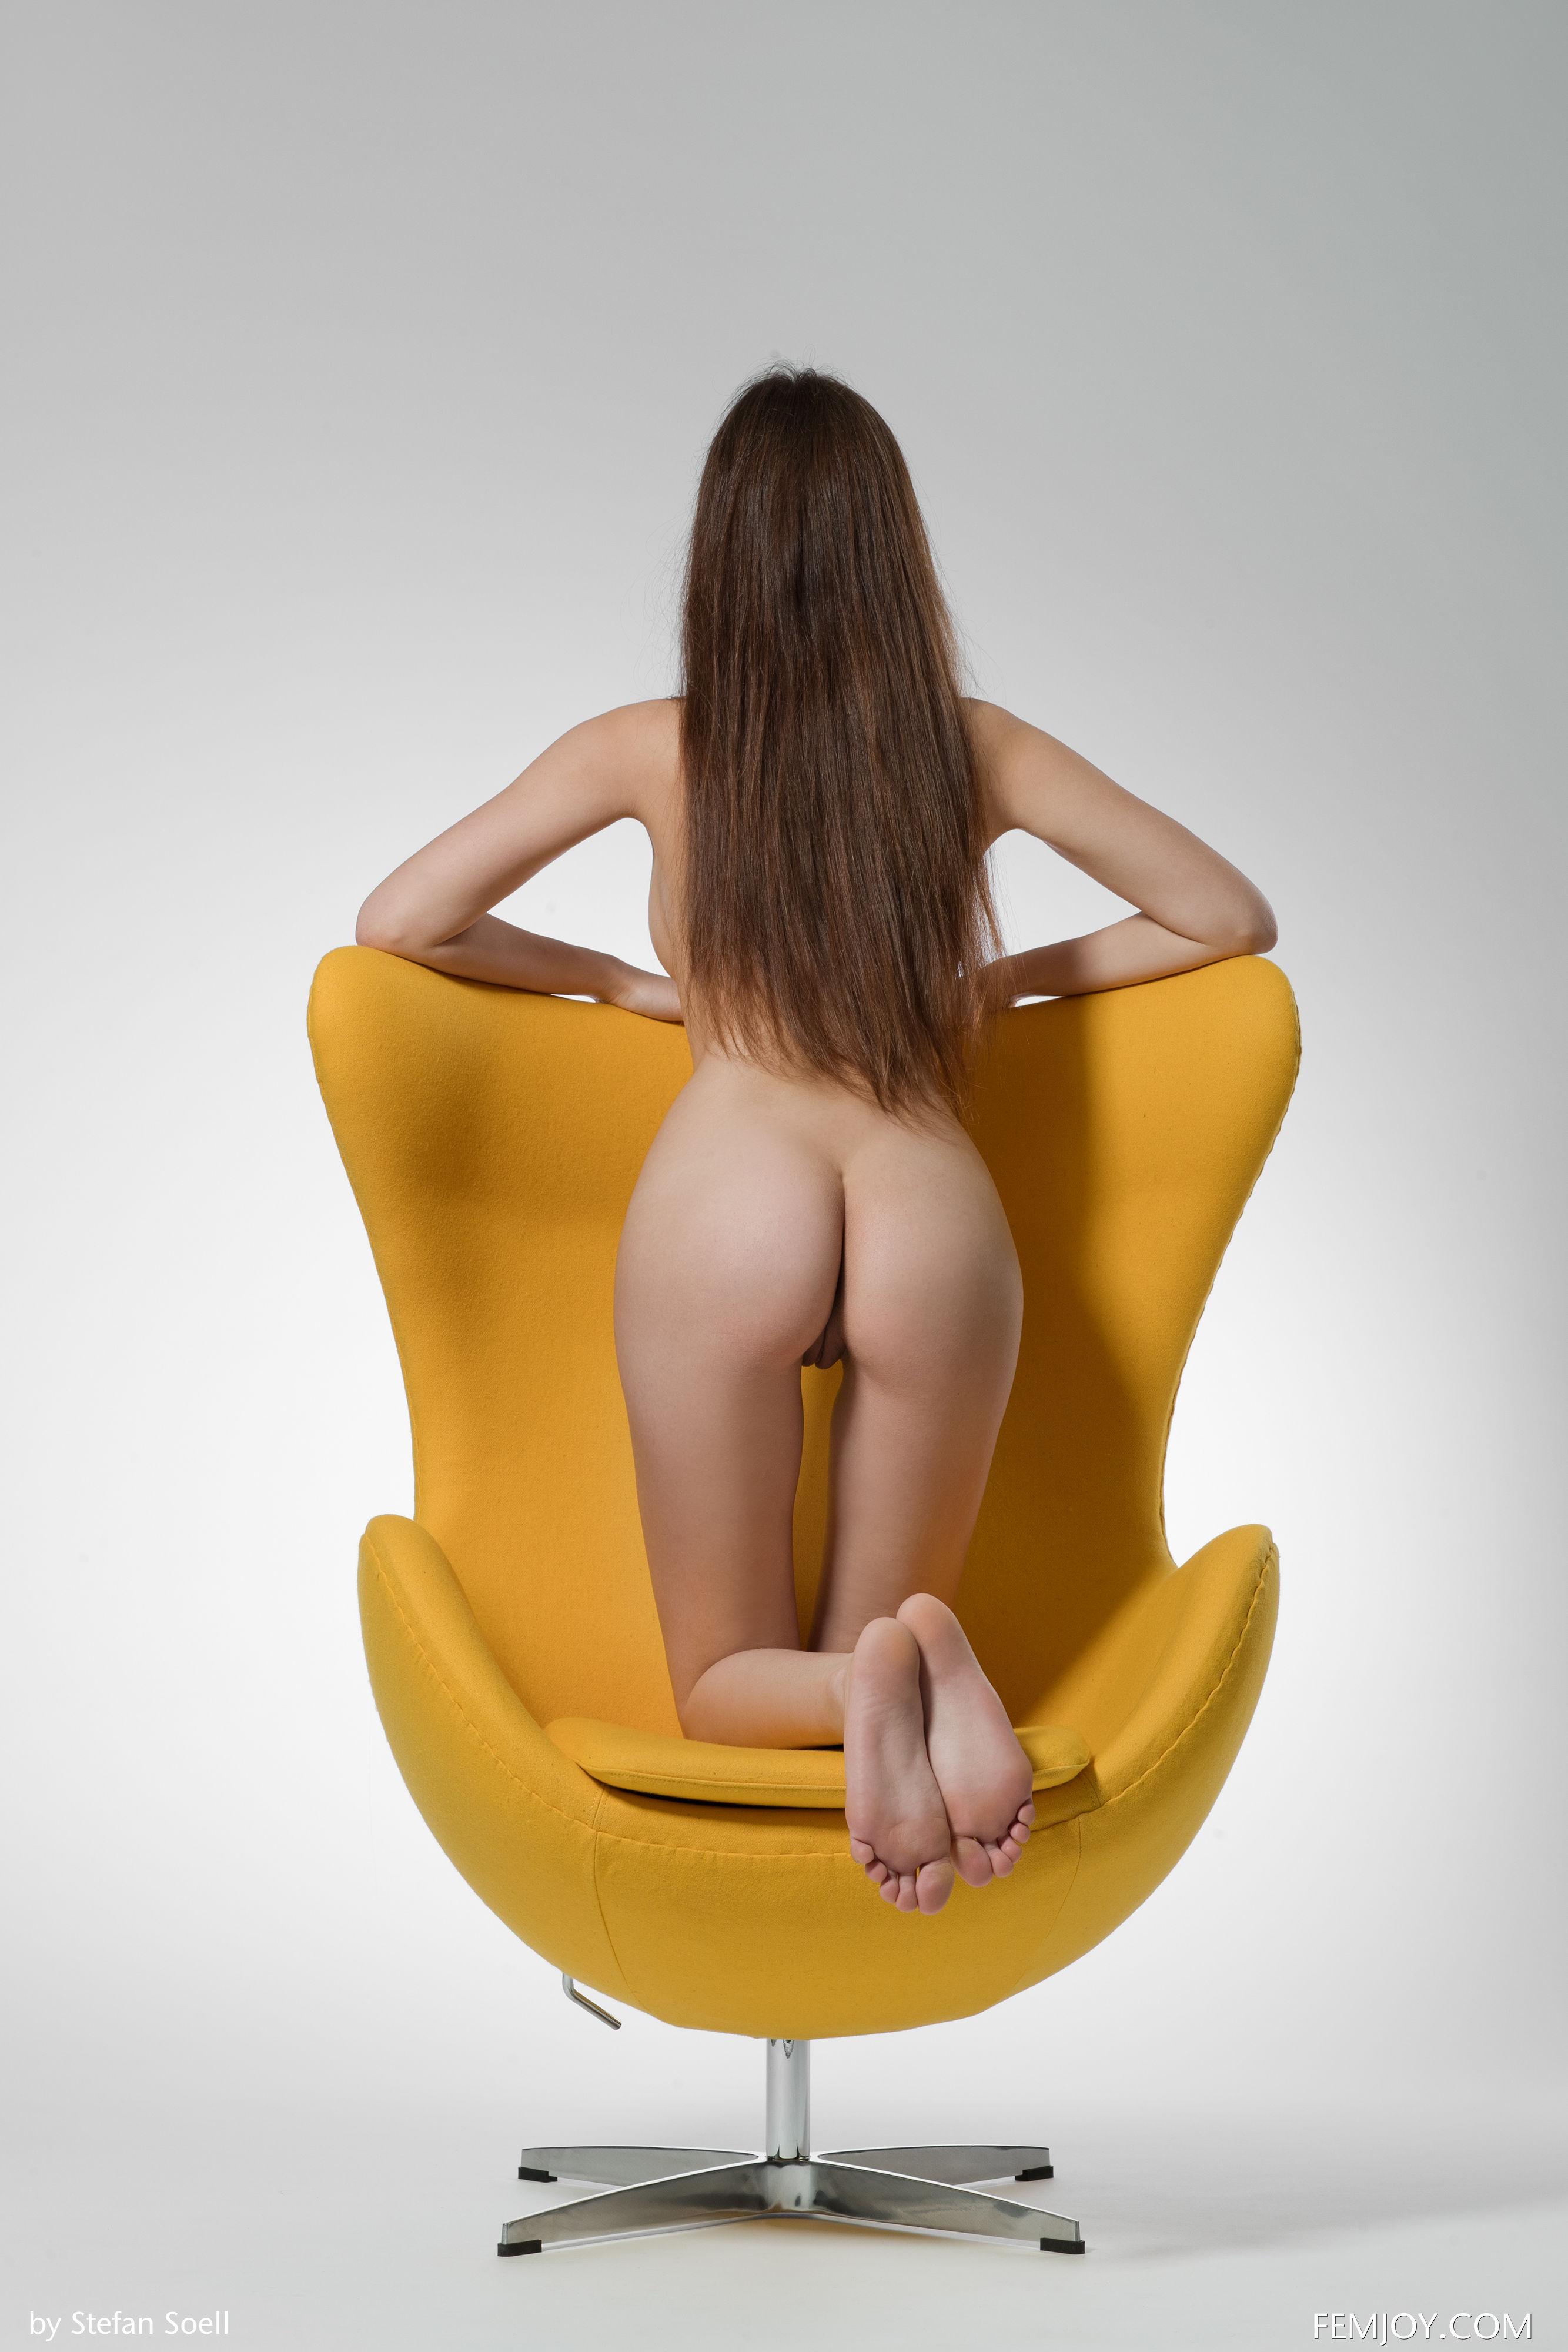 76857678_alisai_femjoy_stefansoell_yellow_19052018p_25.jpg